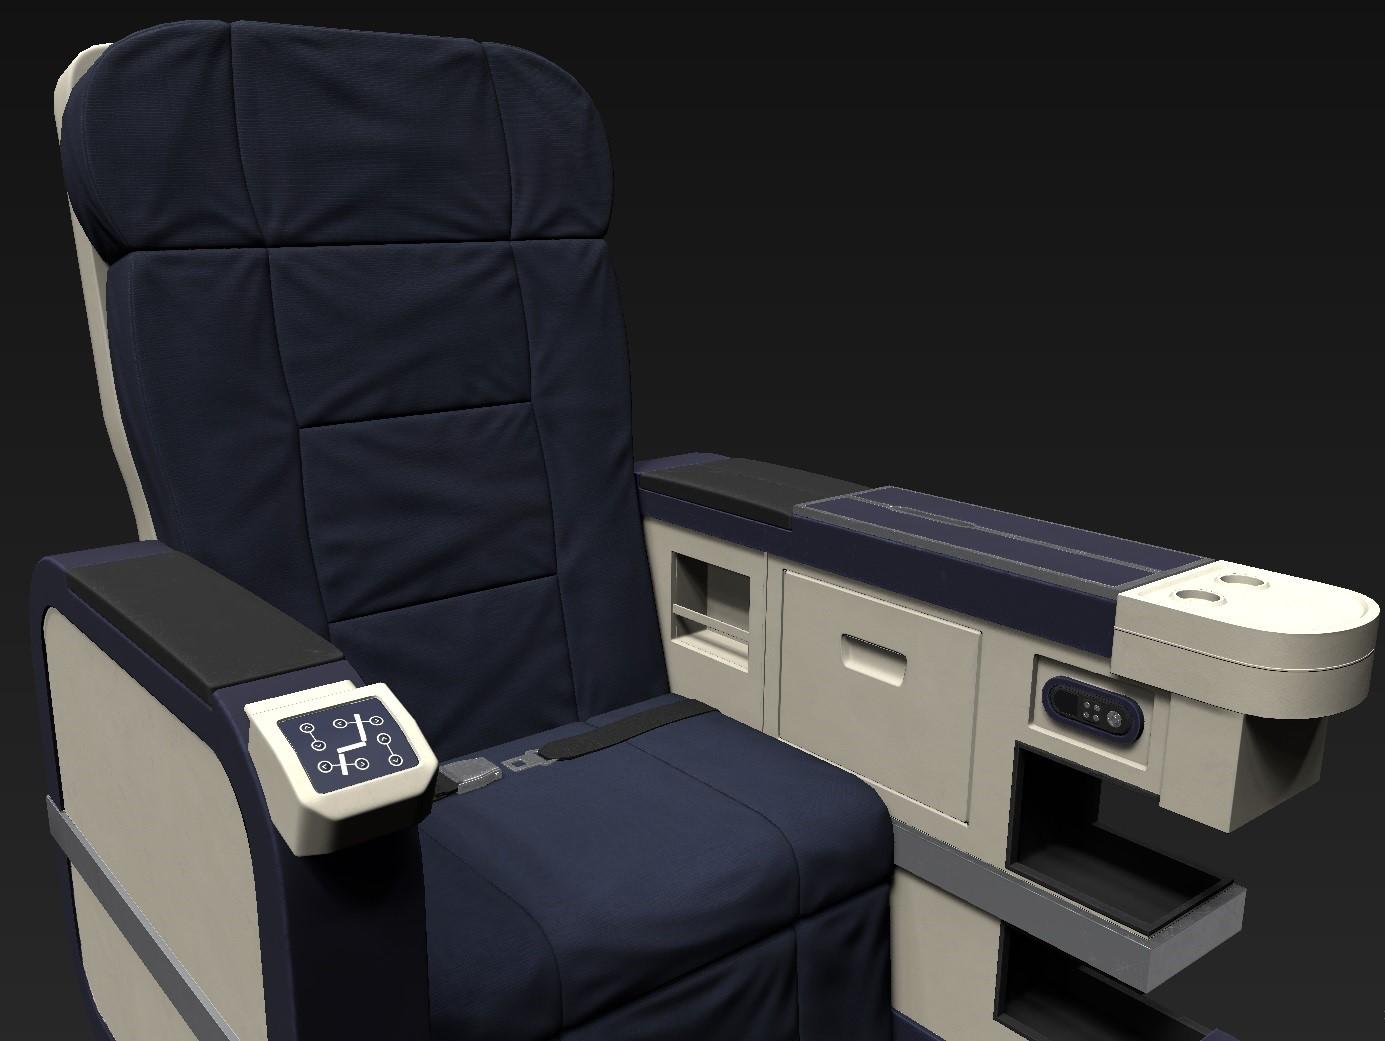 Airplane_Seat_20.jpg